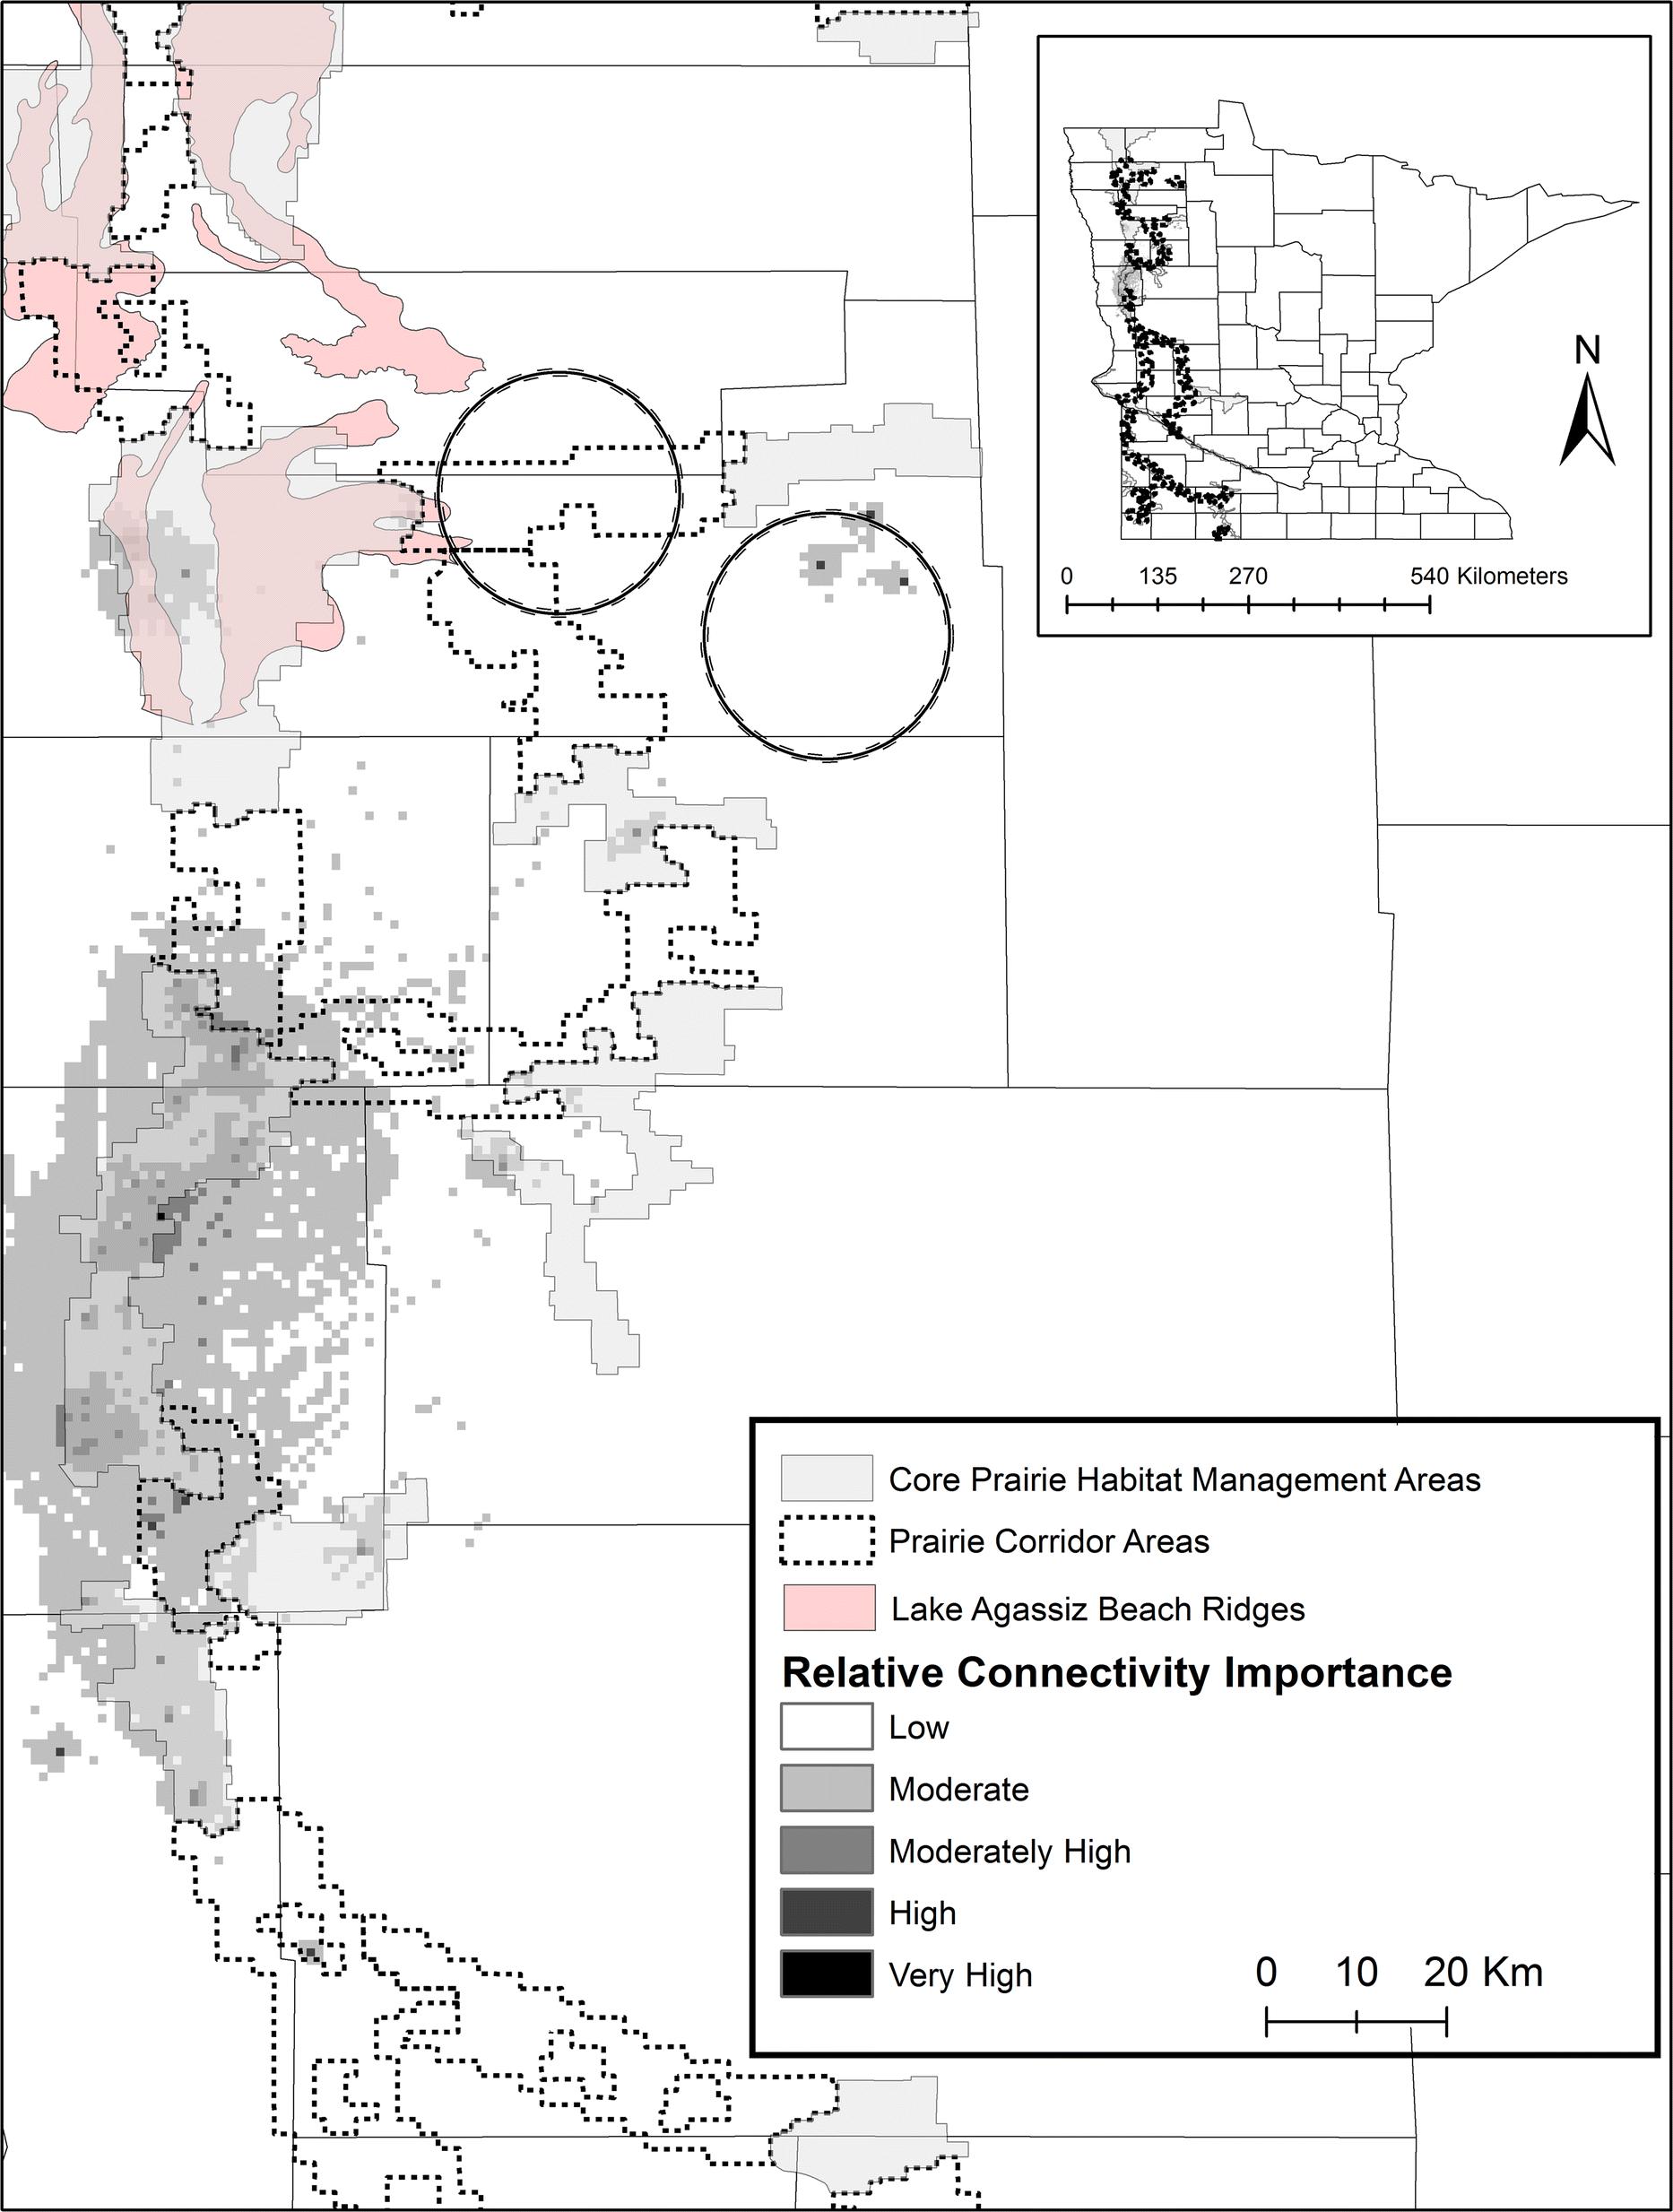 Landscape genetic evaluation of a tallgrass prairie corridor